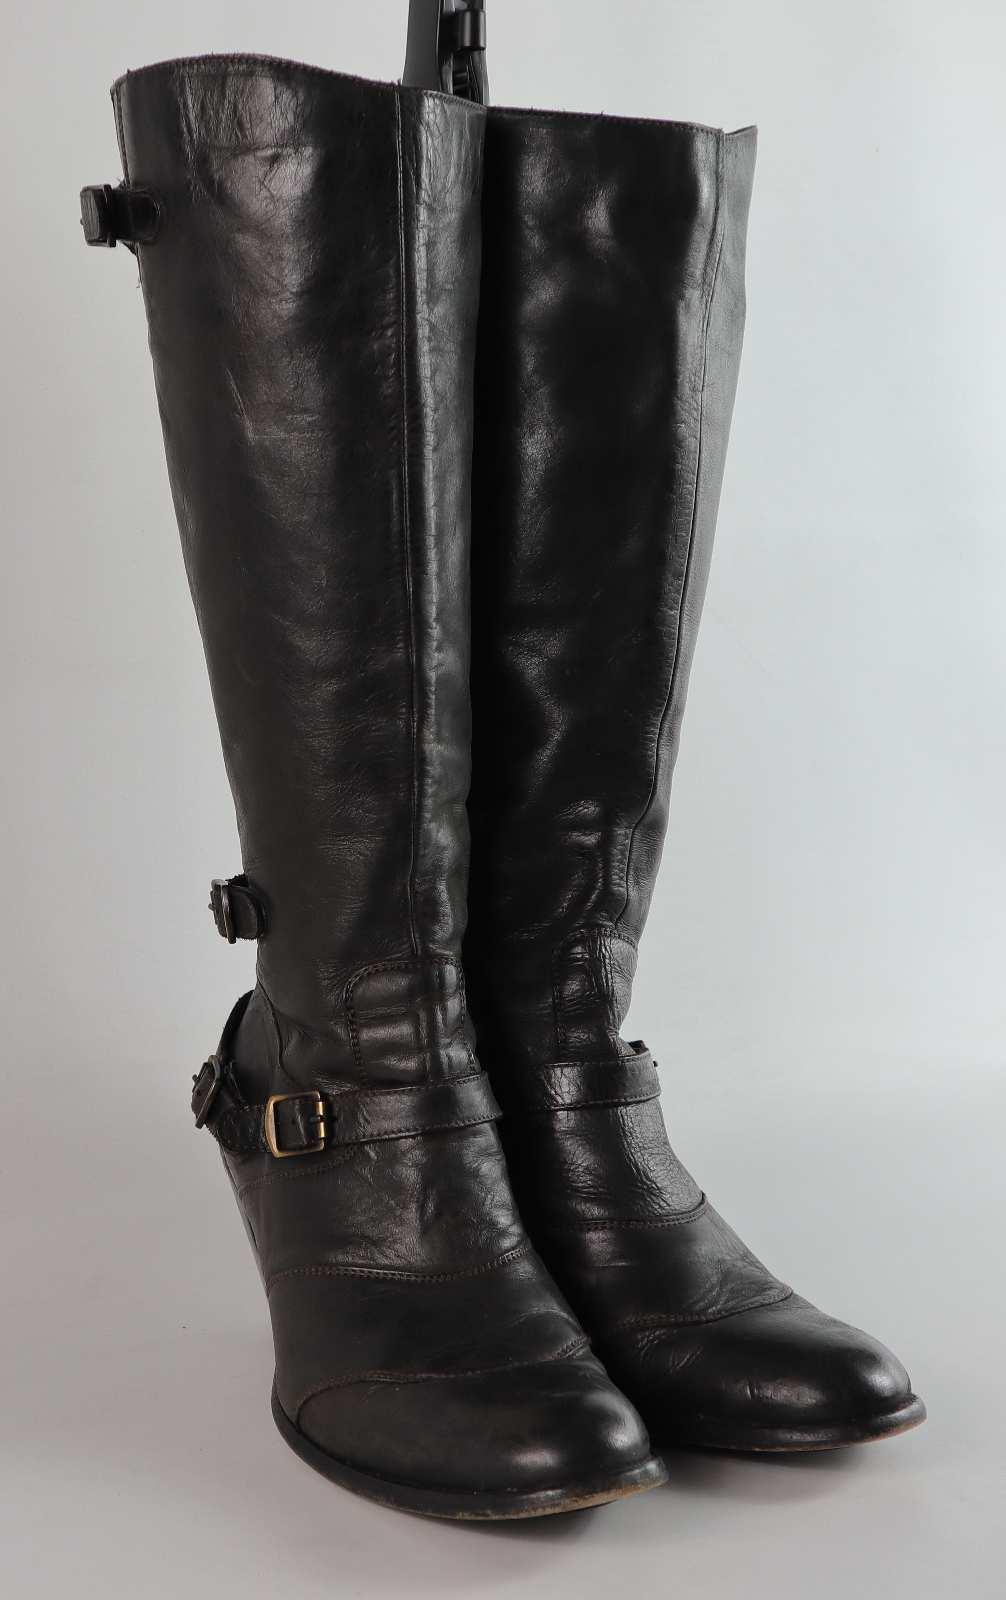 BELSTAFF TRIALMASTER Femme EU Taille 41 en cuir cuir cuir Noir Genou-Bottes hautes fe49fc